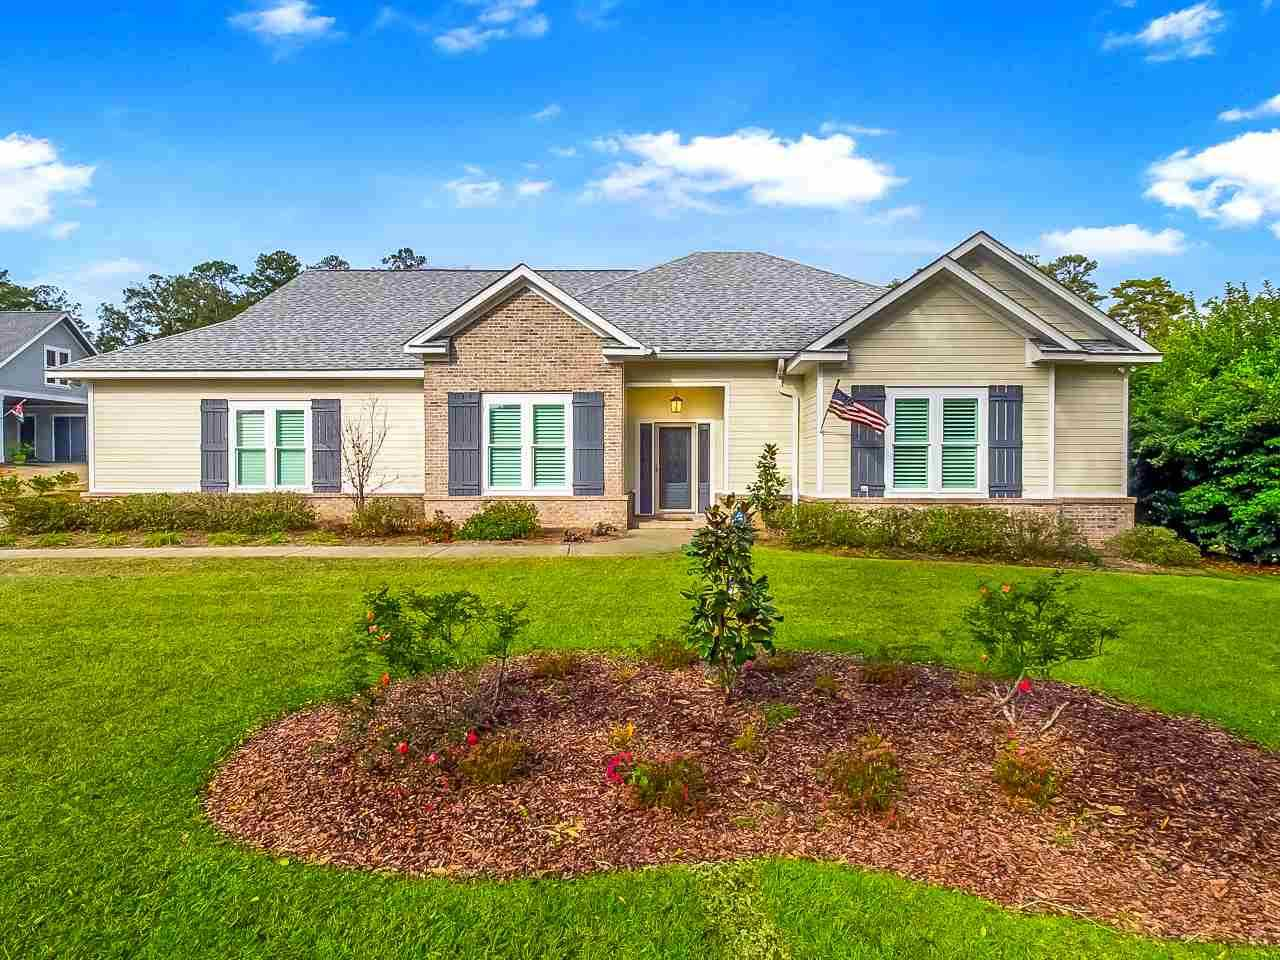 2610 Thomasville Road Tallahassee, FL 32308 in Gardenia Gardens Photo 1